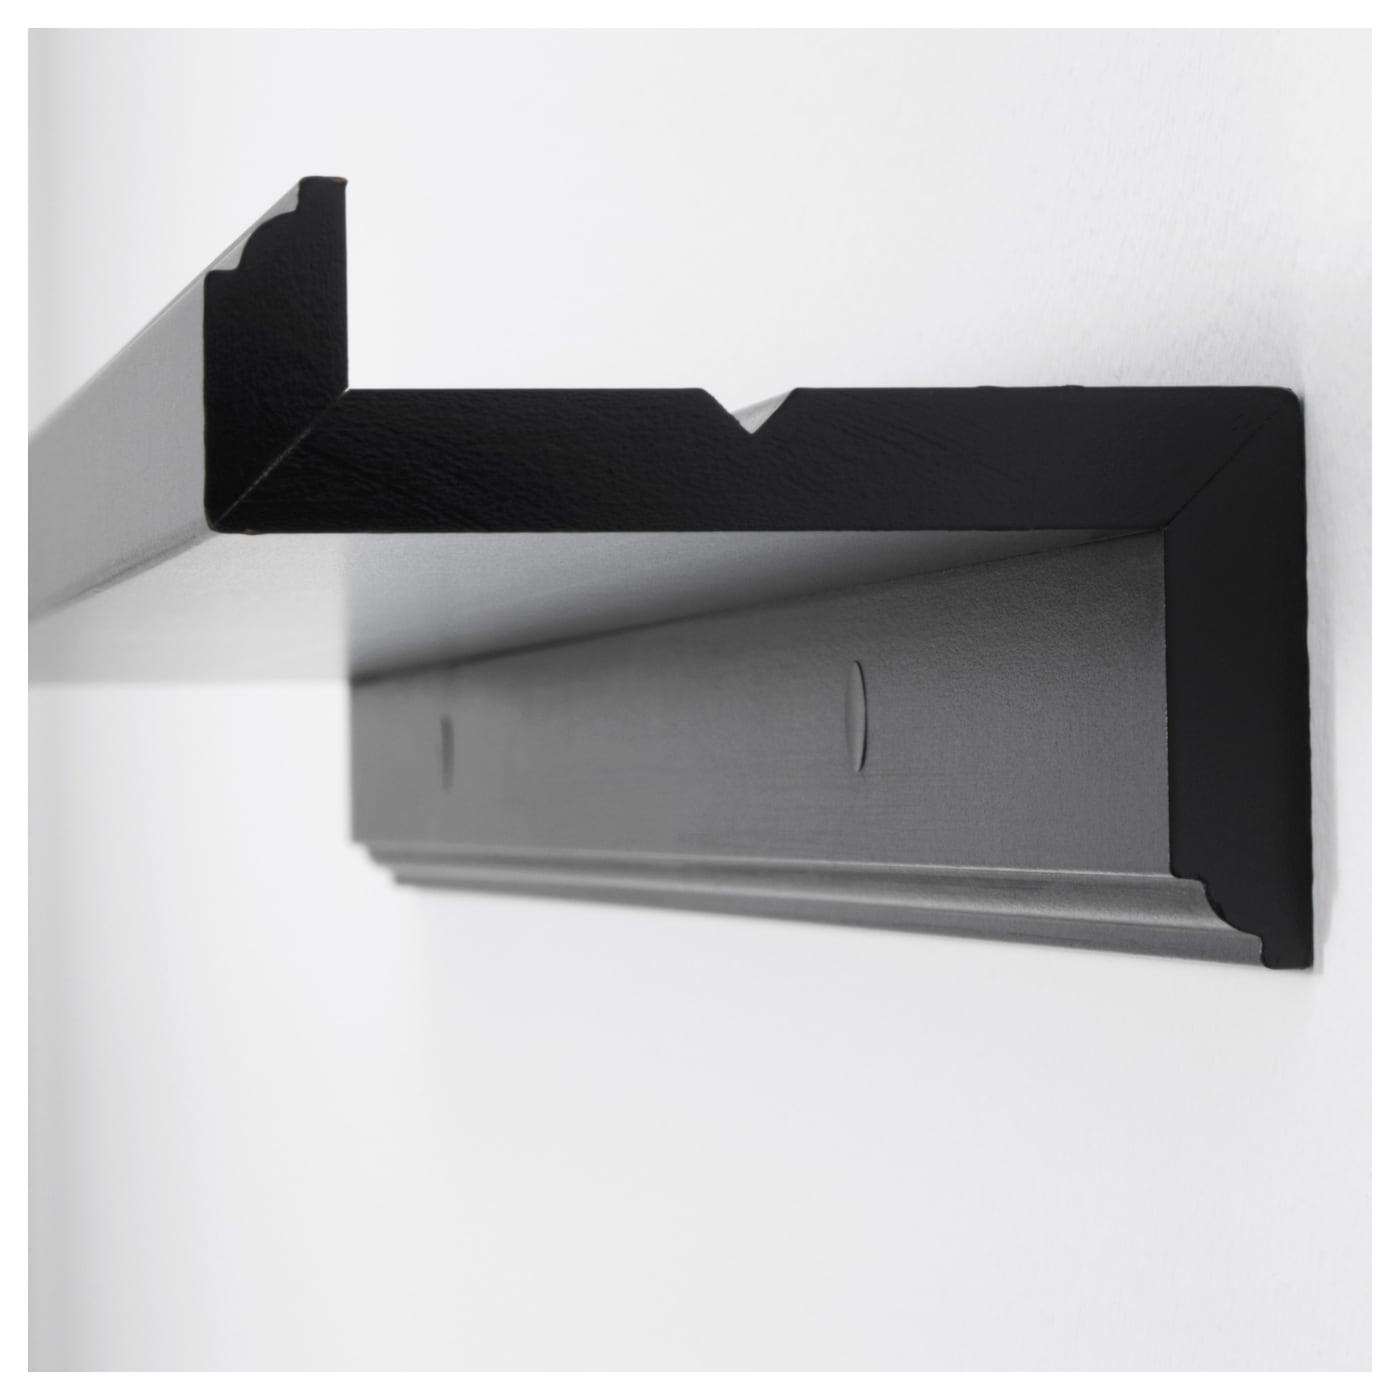 Marietorp Picture Ledge Black 75 Cm Ikea